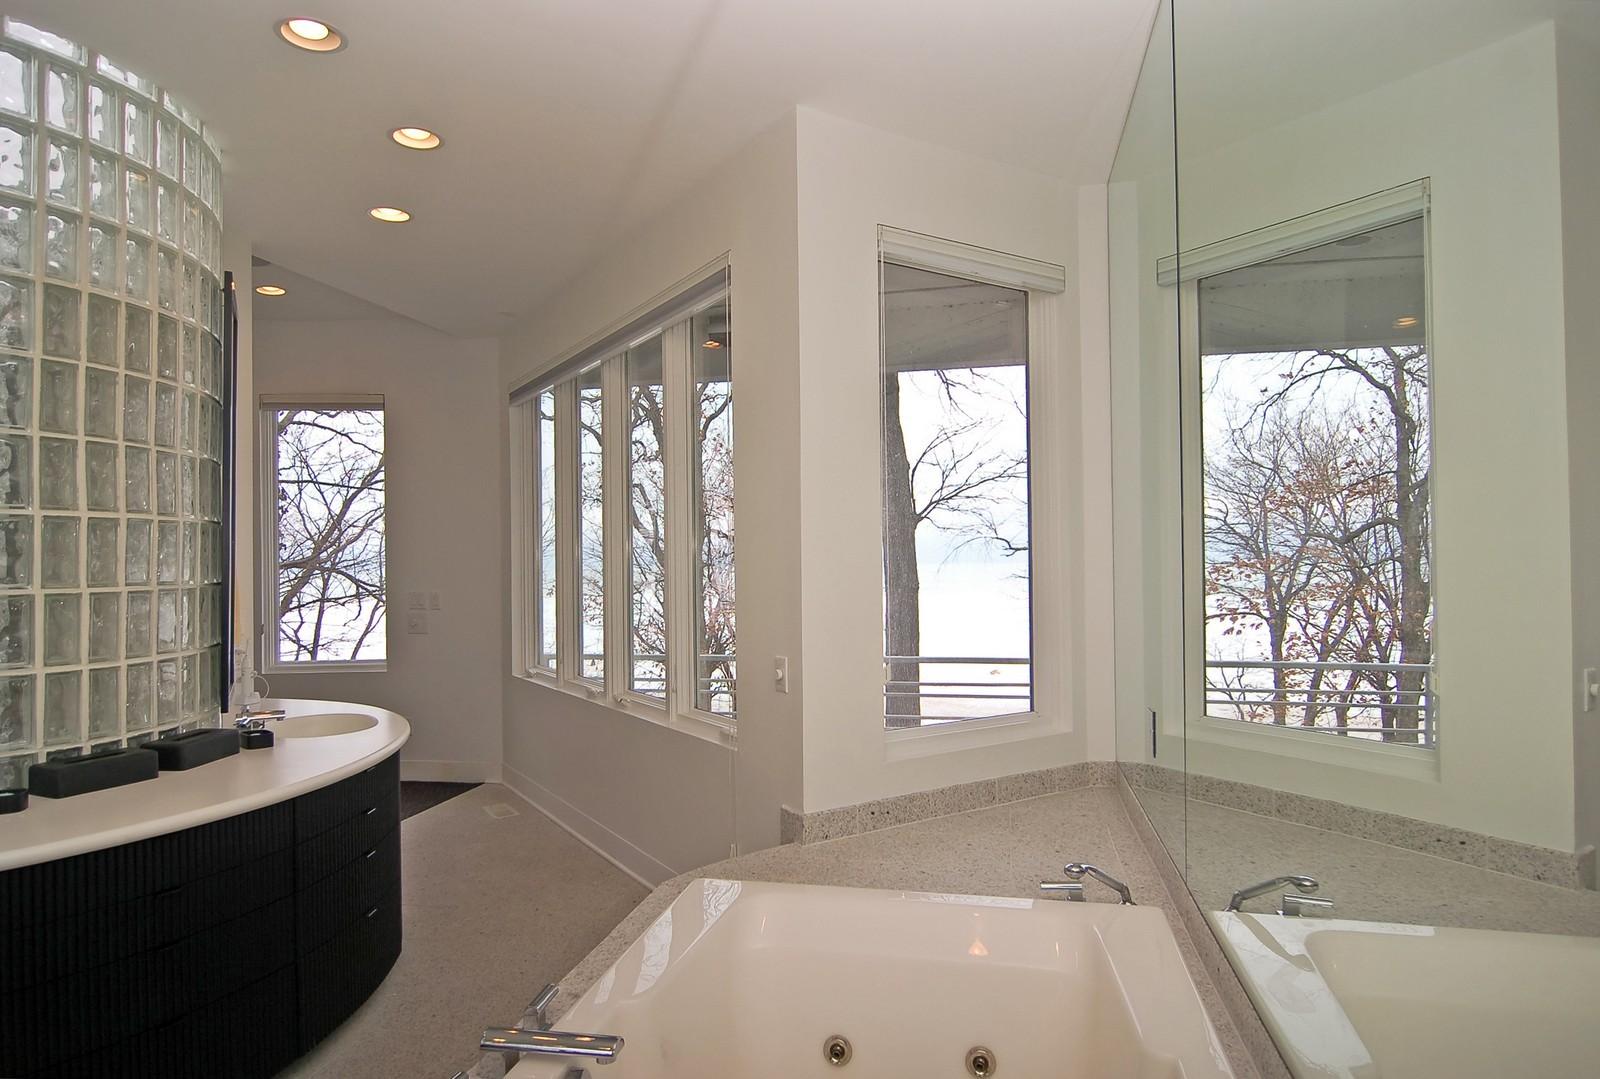 Real Estate Photography - 15930 Lake Ave, Union Pier, MI, 49129 - Master Bathroom